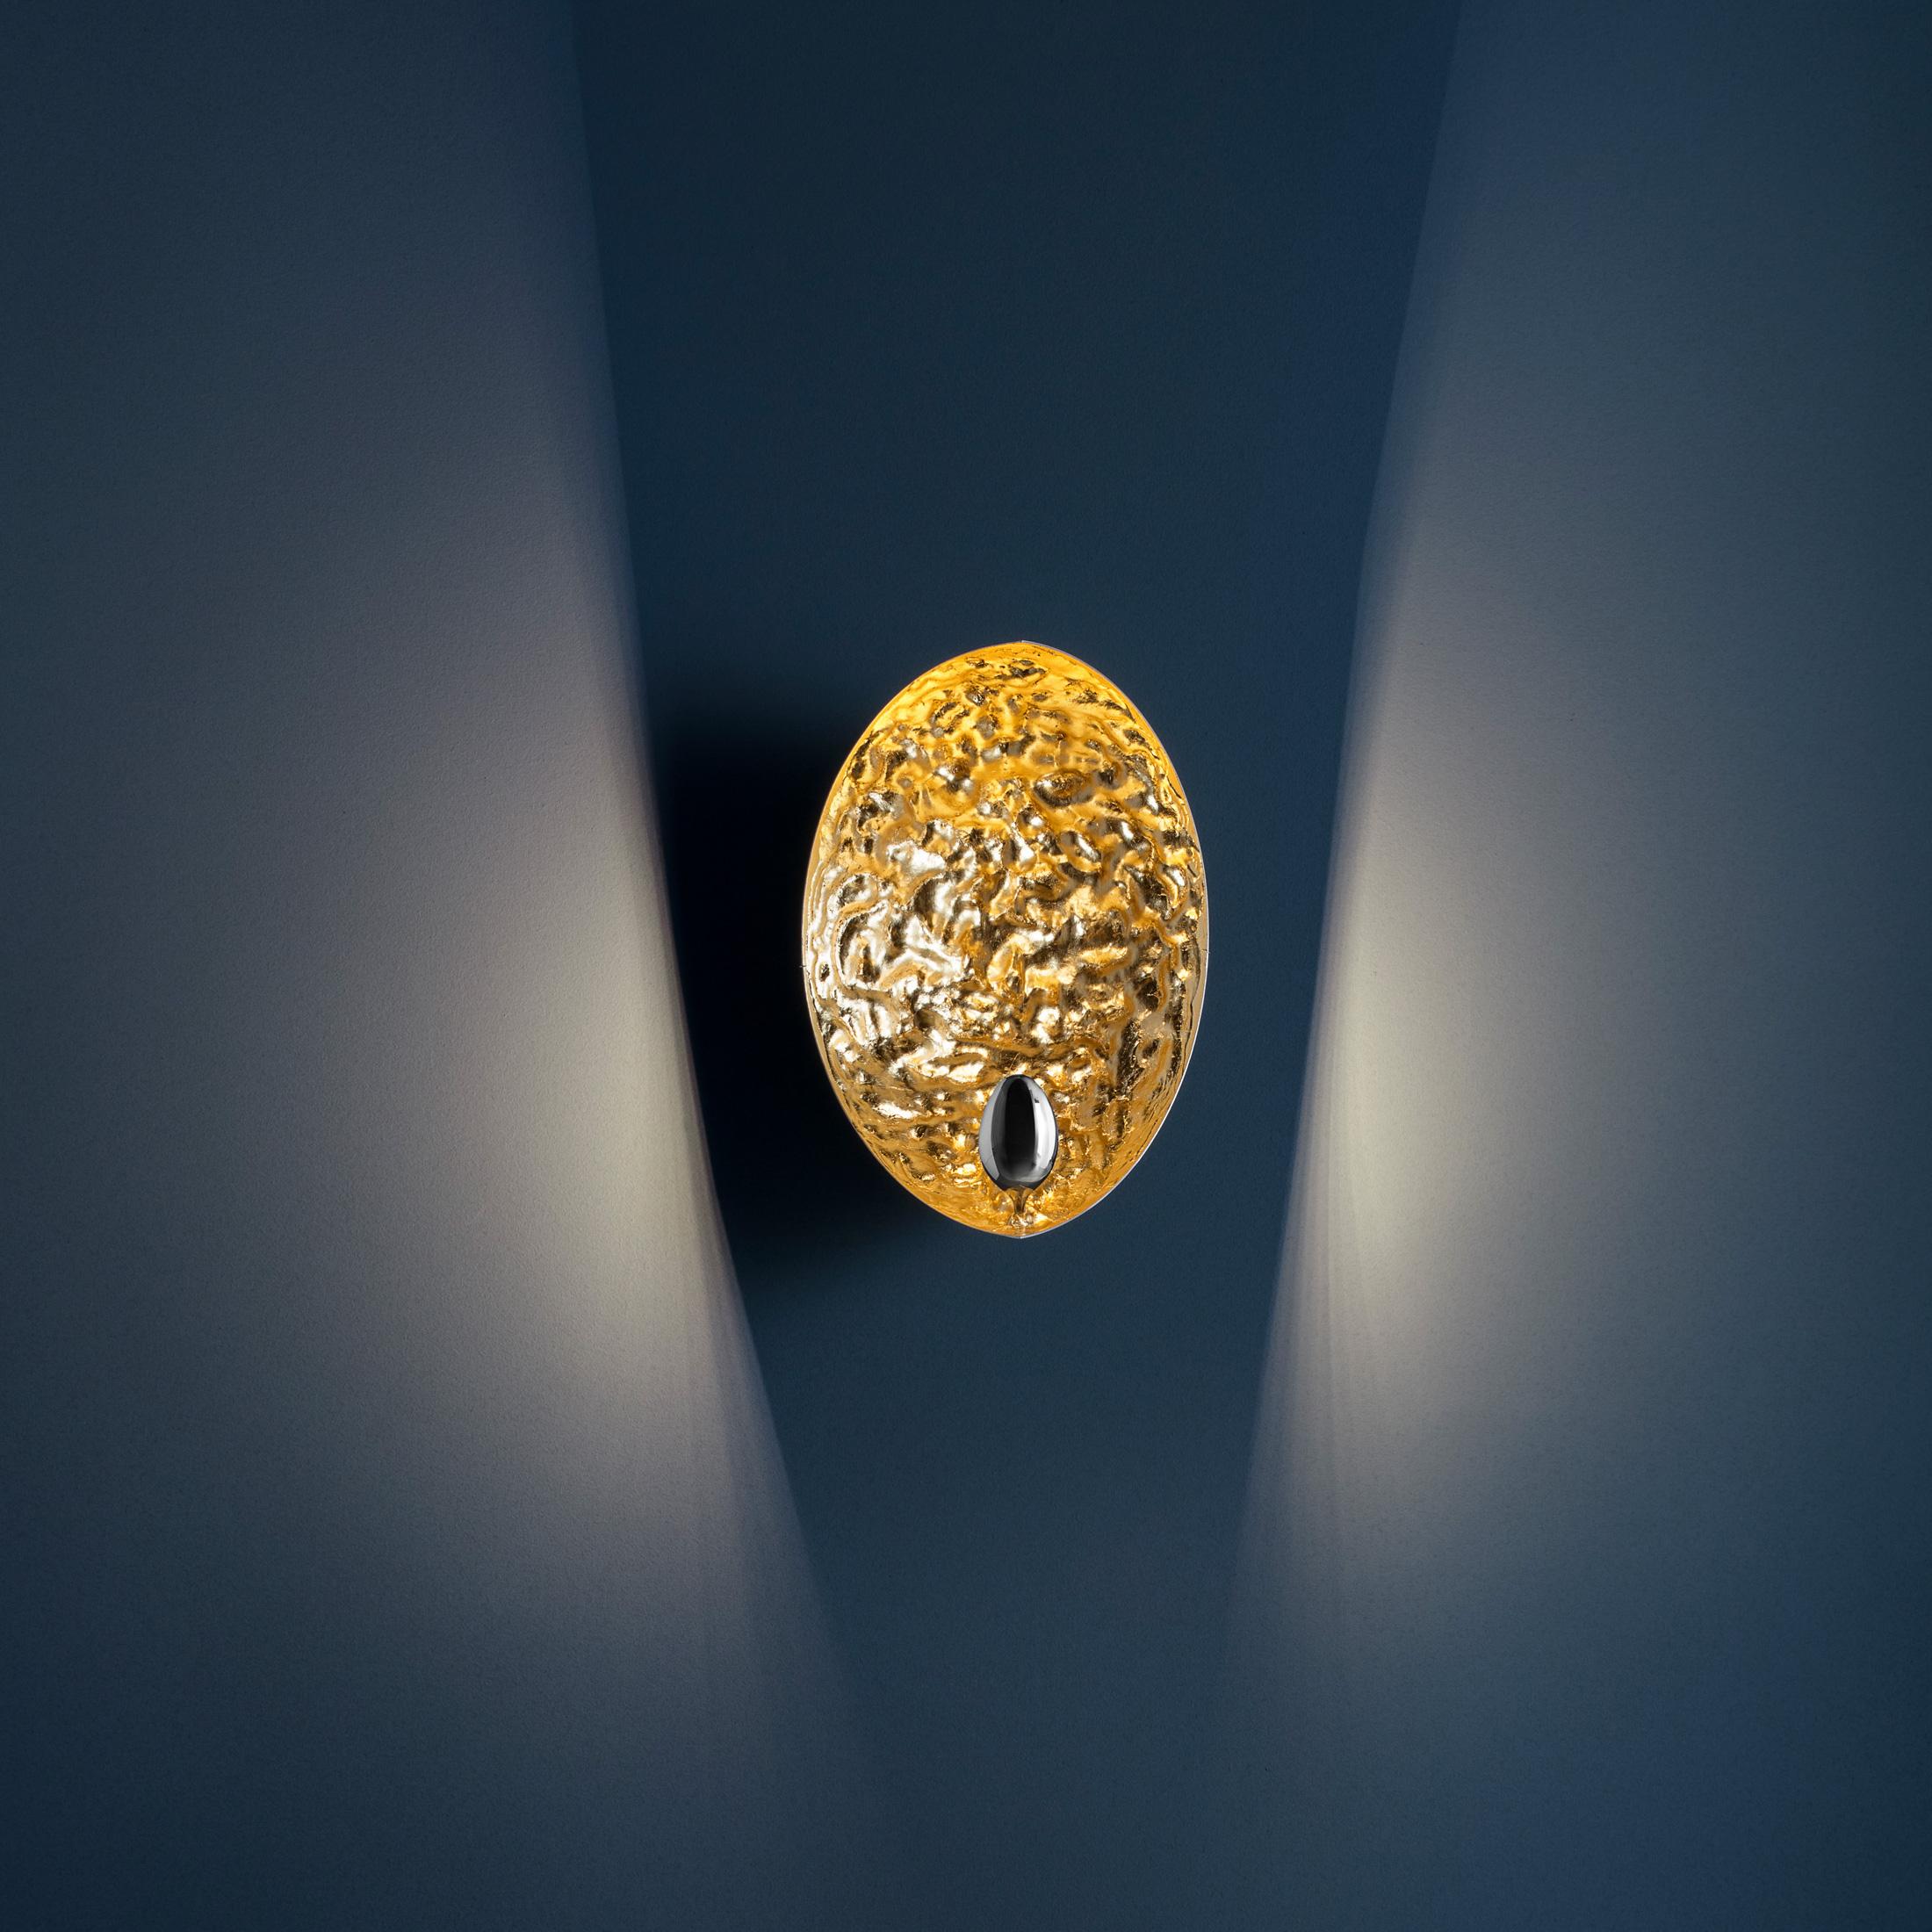 Stchu-Moon 05 Wall Light